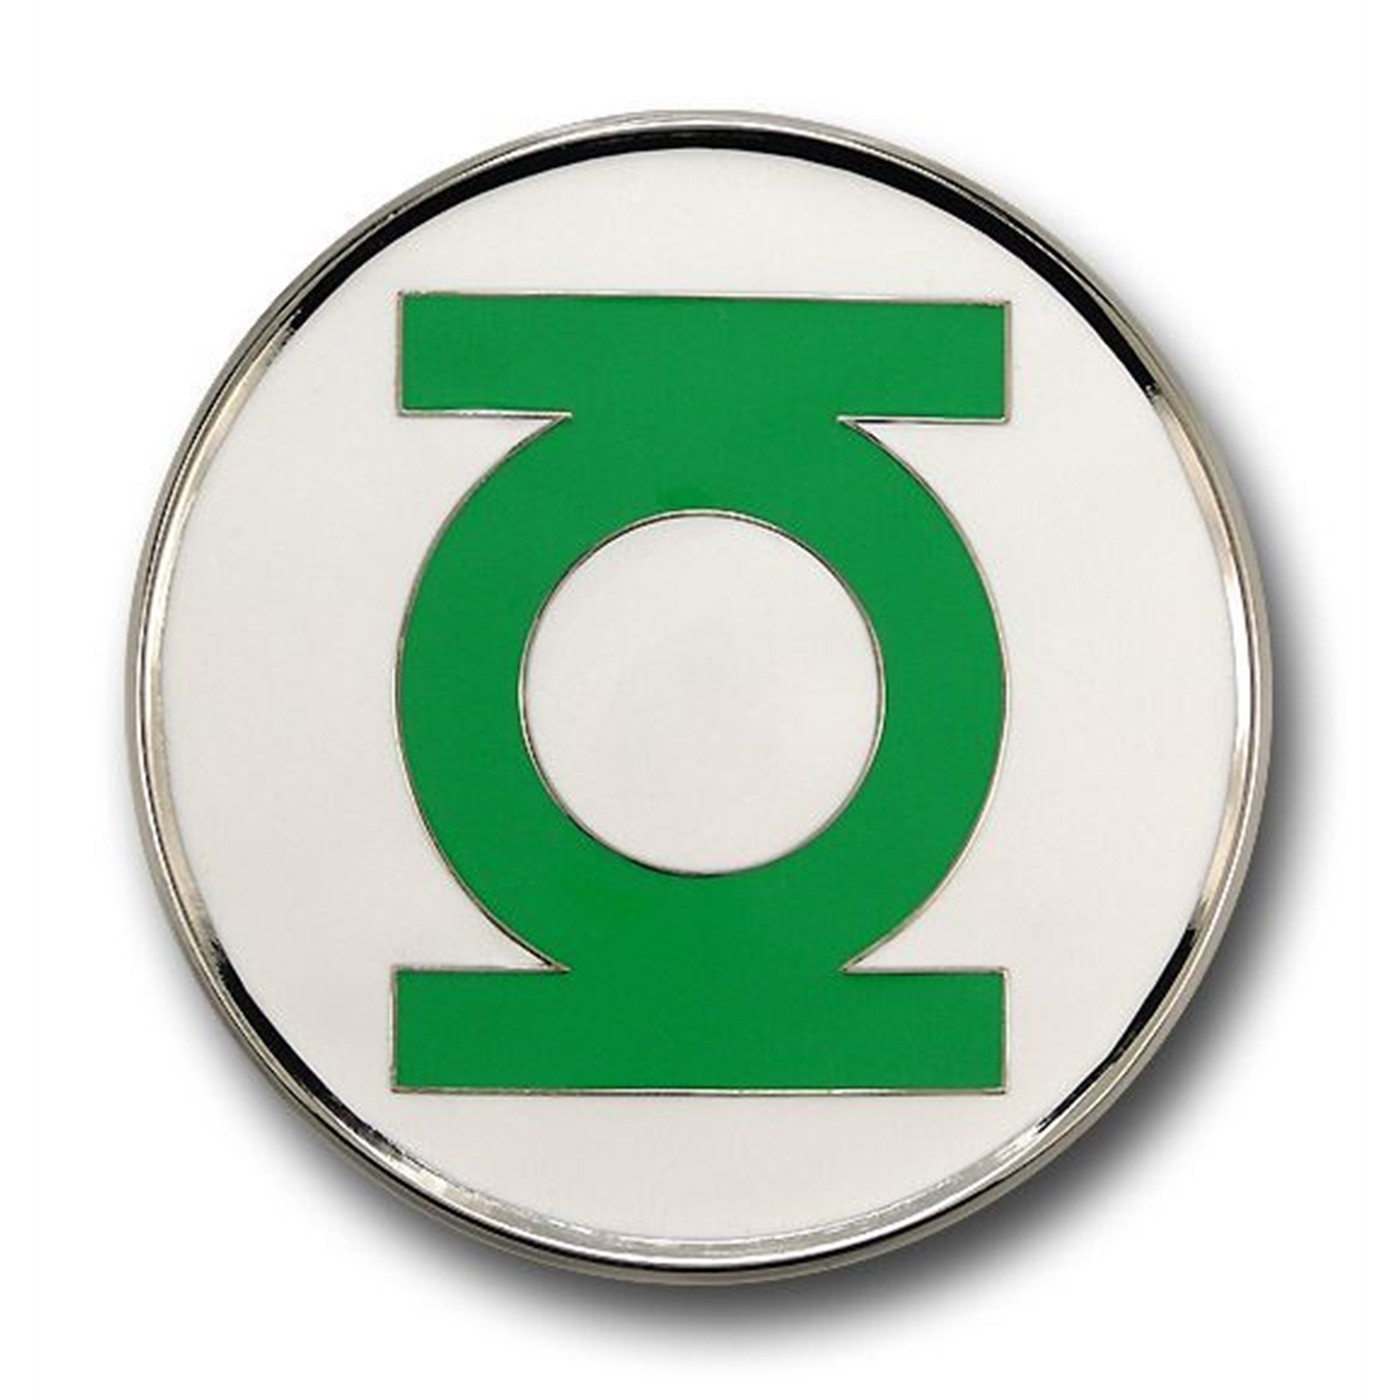 Green Lantern Belt Buckle Silver Edge